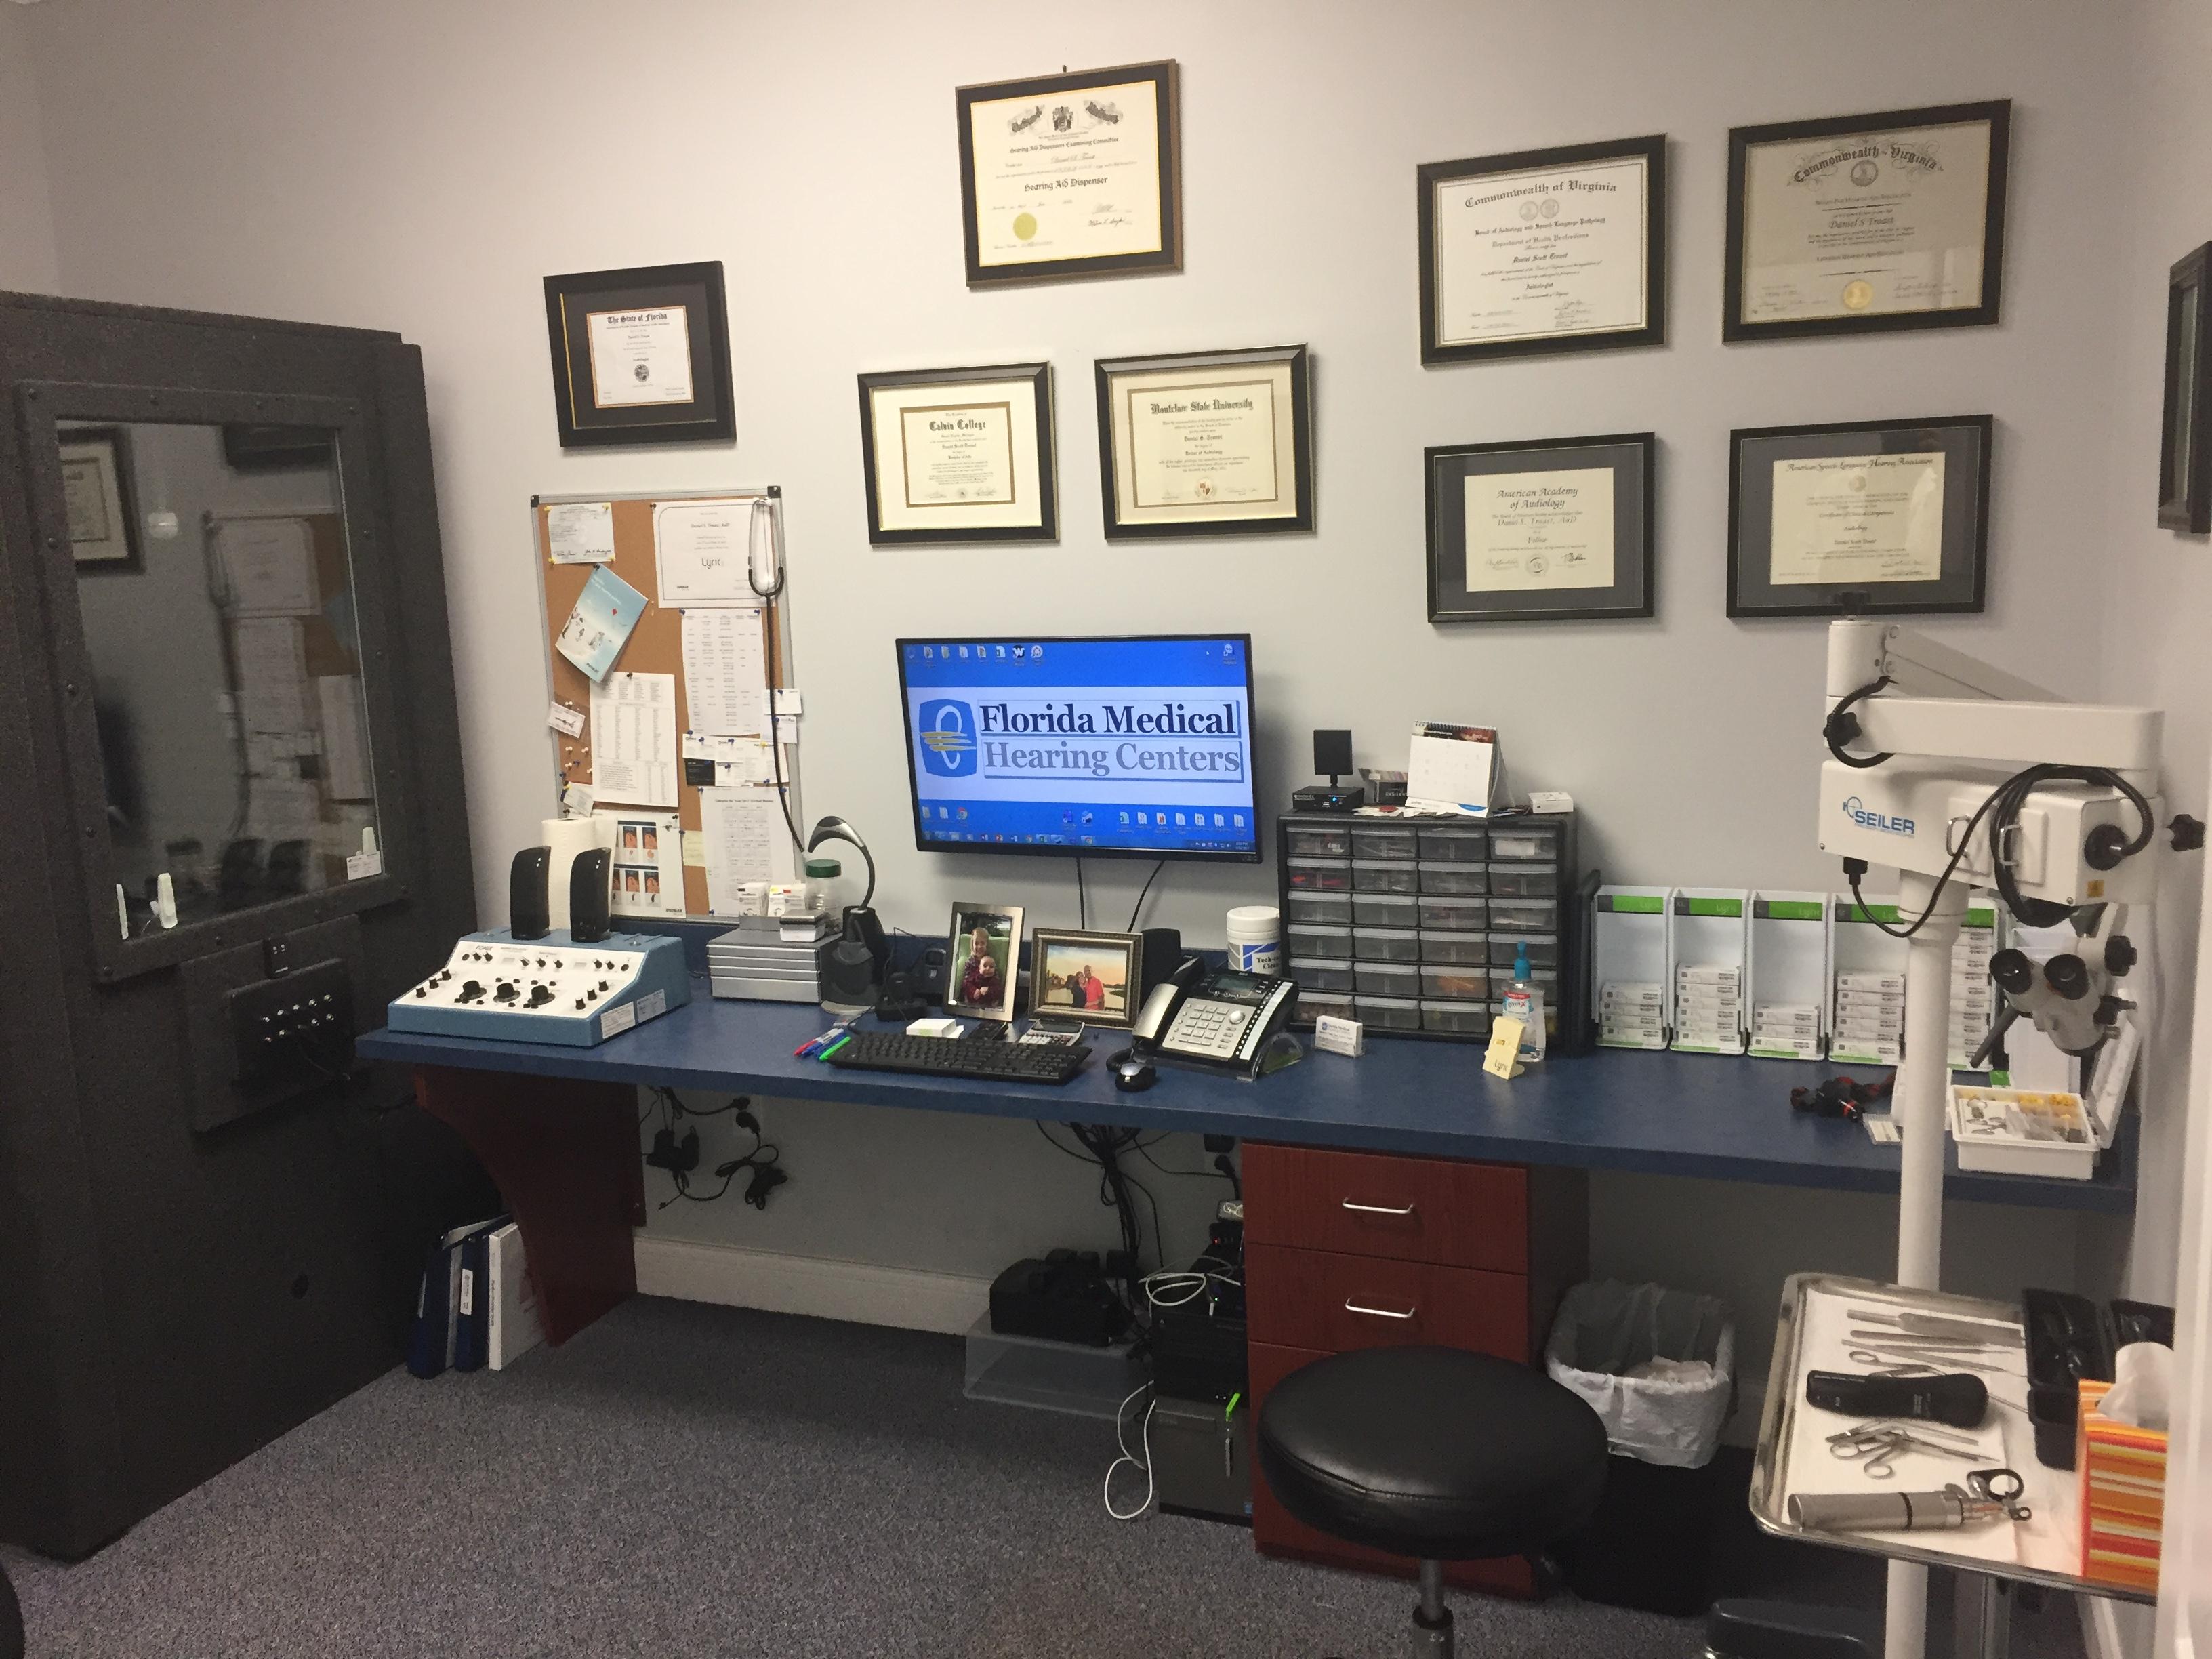 Florida Medical Hearing Centers In Winter Garden Fl 34787